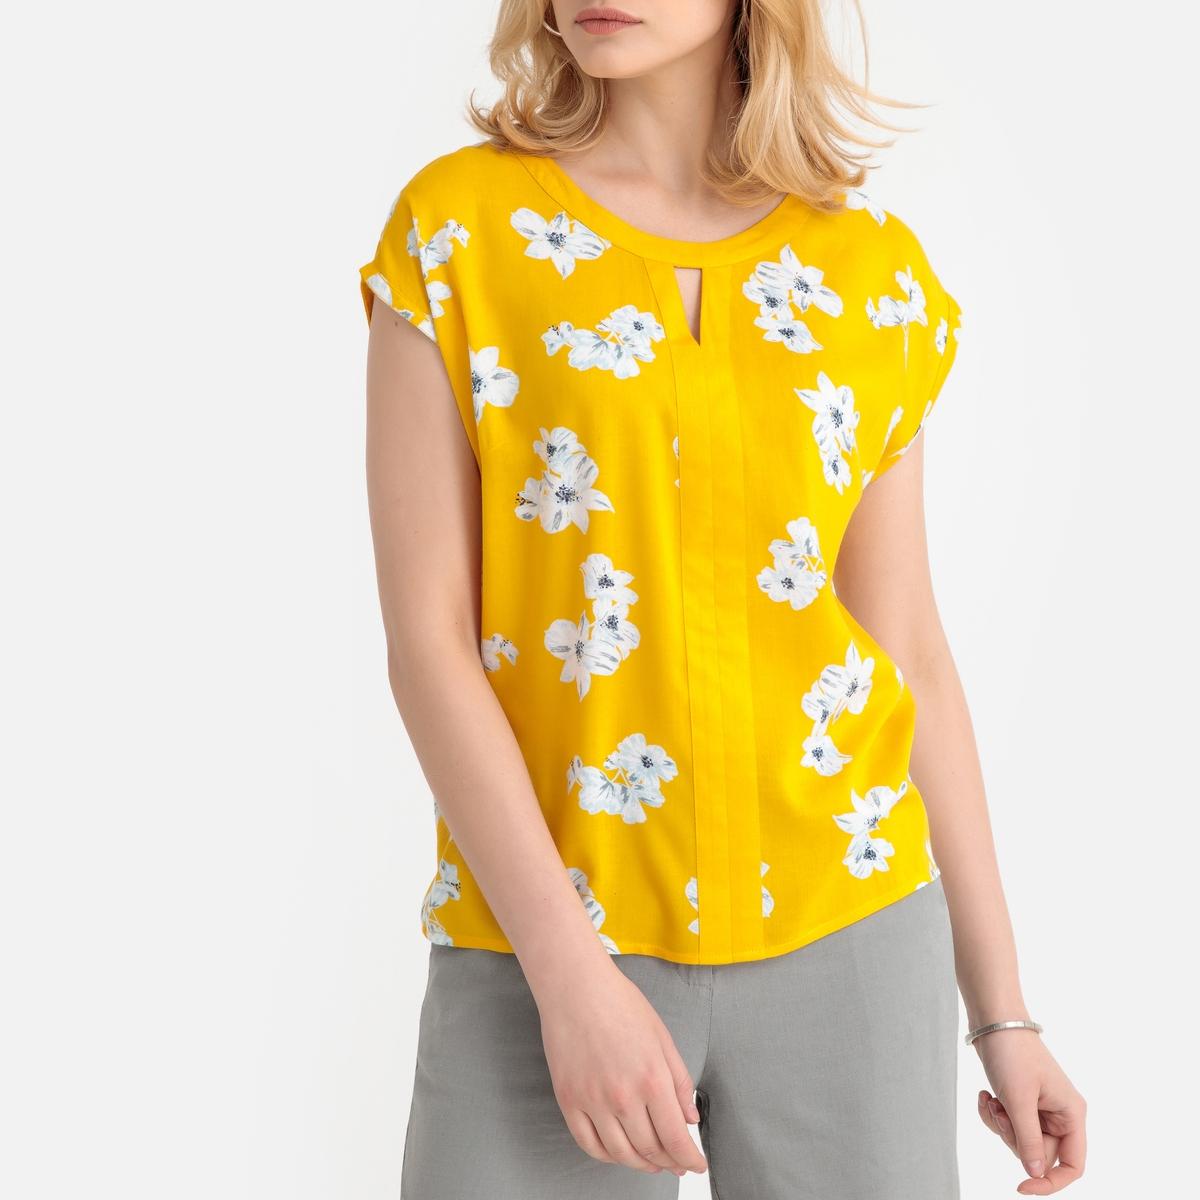 Imagen secundaria de producto de Blusa vaporosa con estampado de flores, manga corta - Anne weyburn